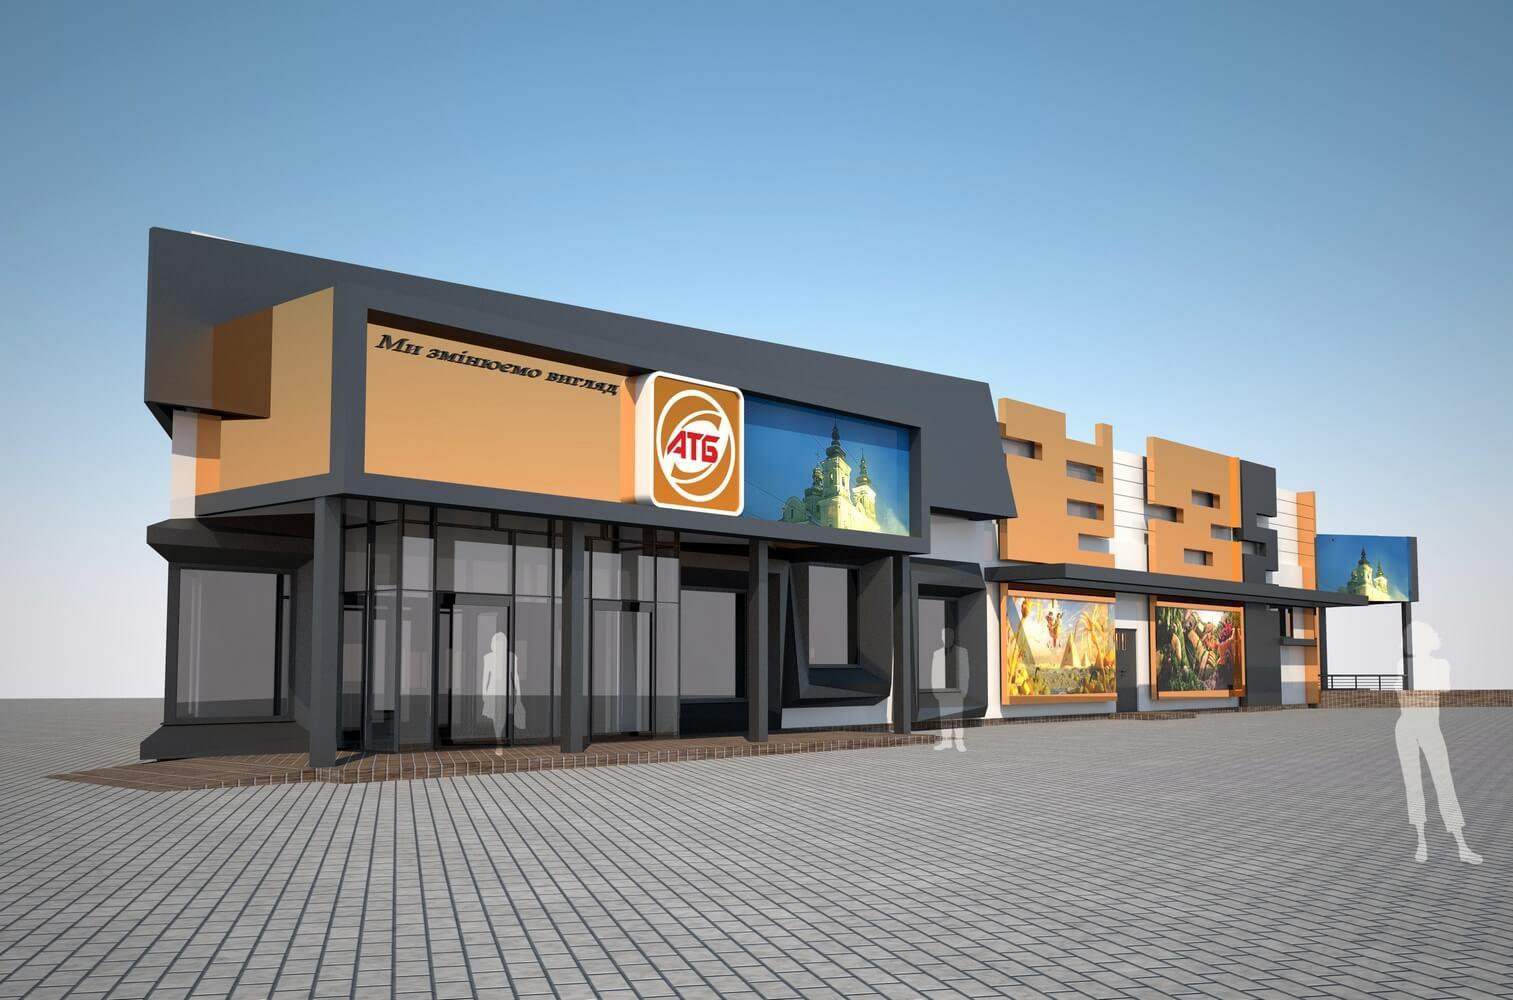 Каскад-Будинвест: проекты компании (изображение 6)